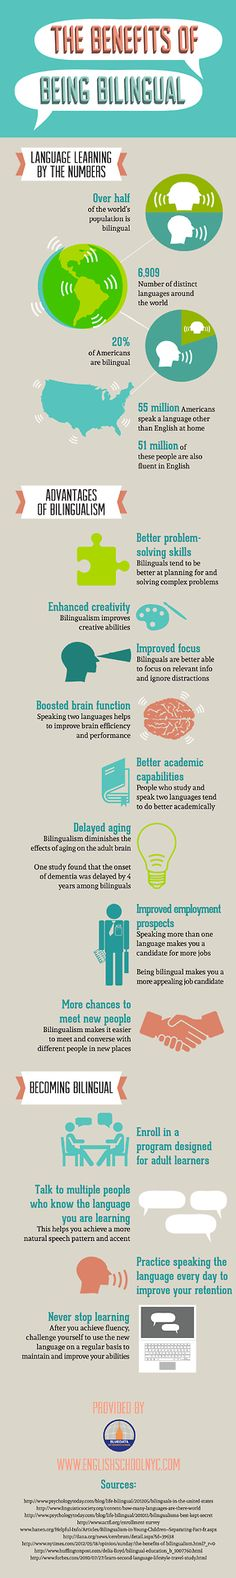 Being Bilingual